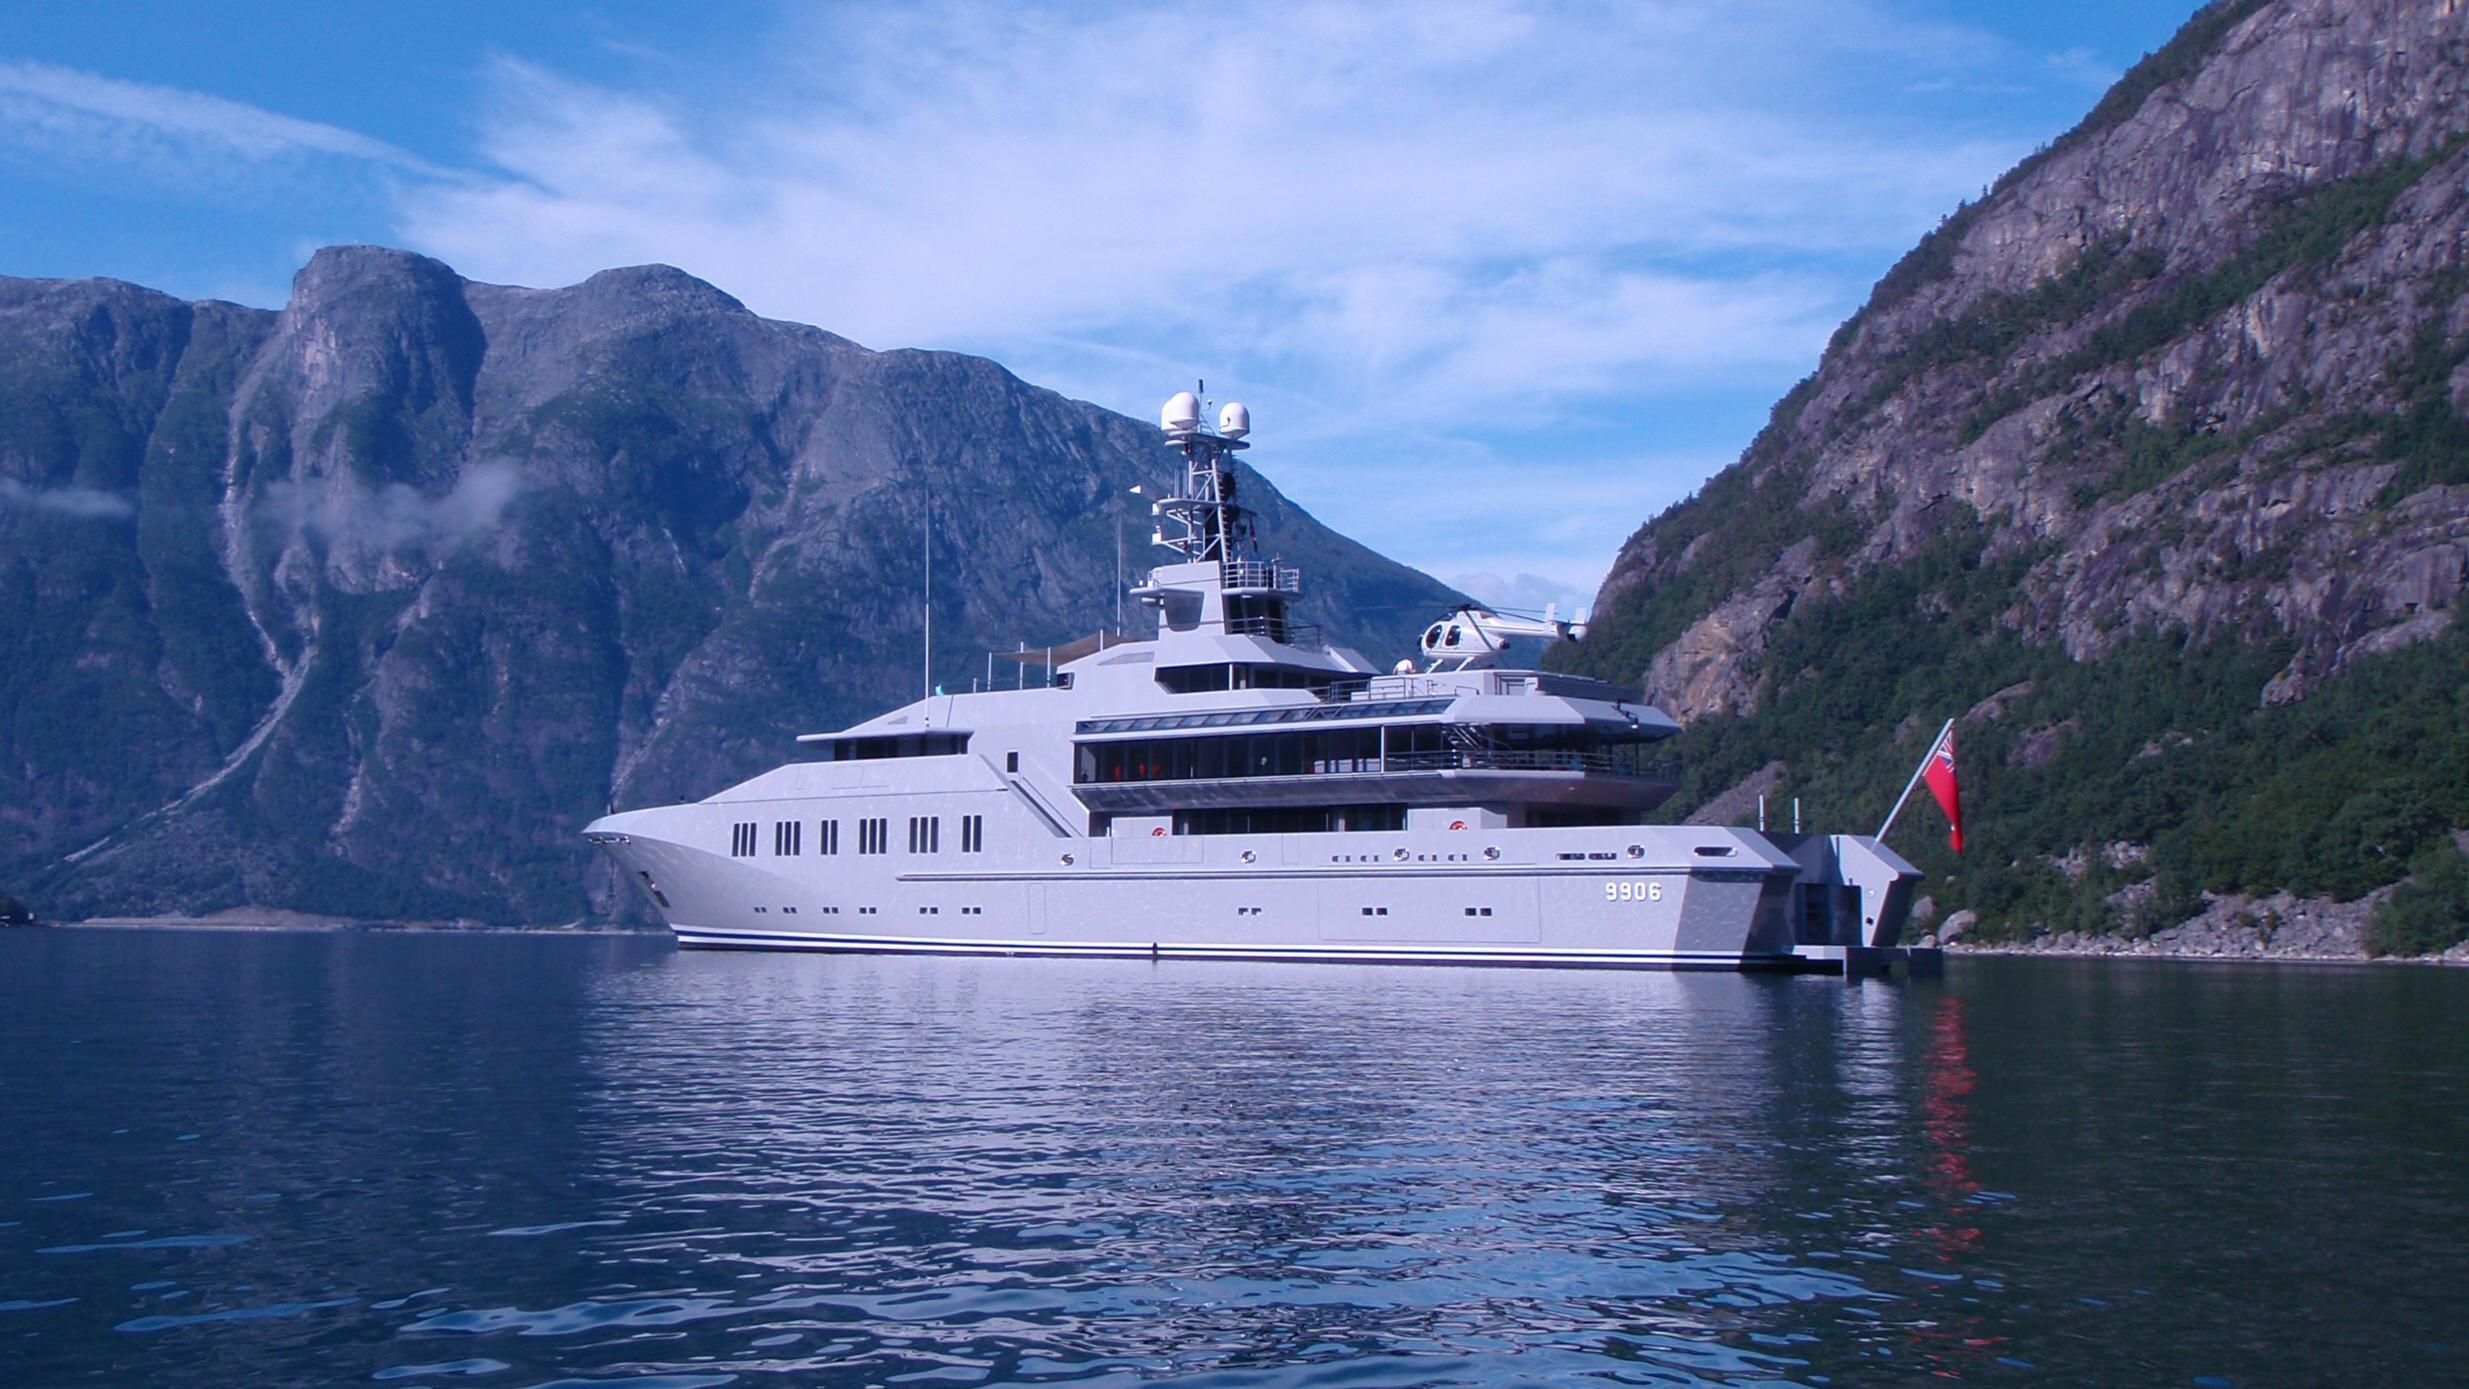 skat-explorer-yacht-lurssen-2002-71m-fjord-profile